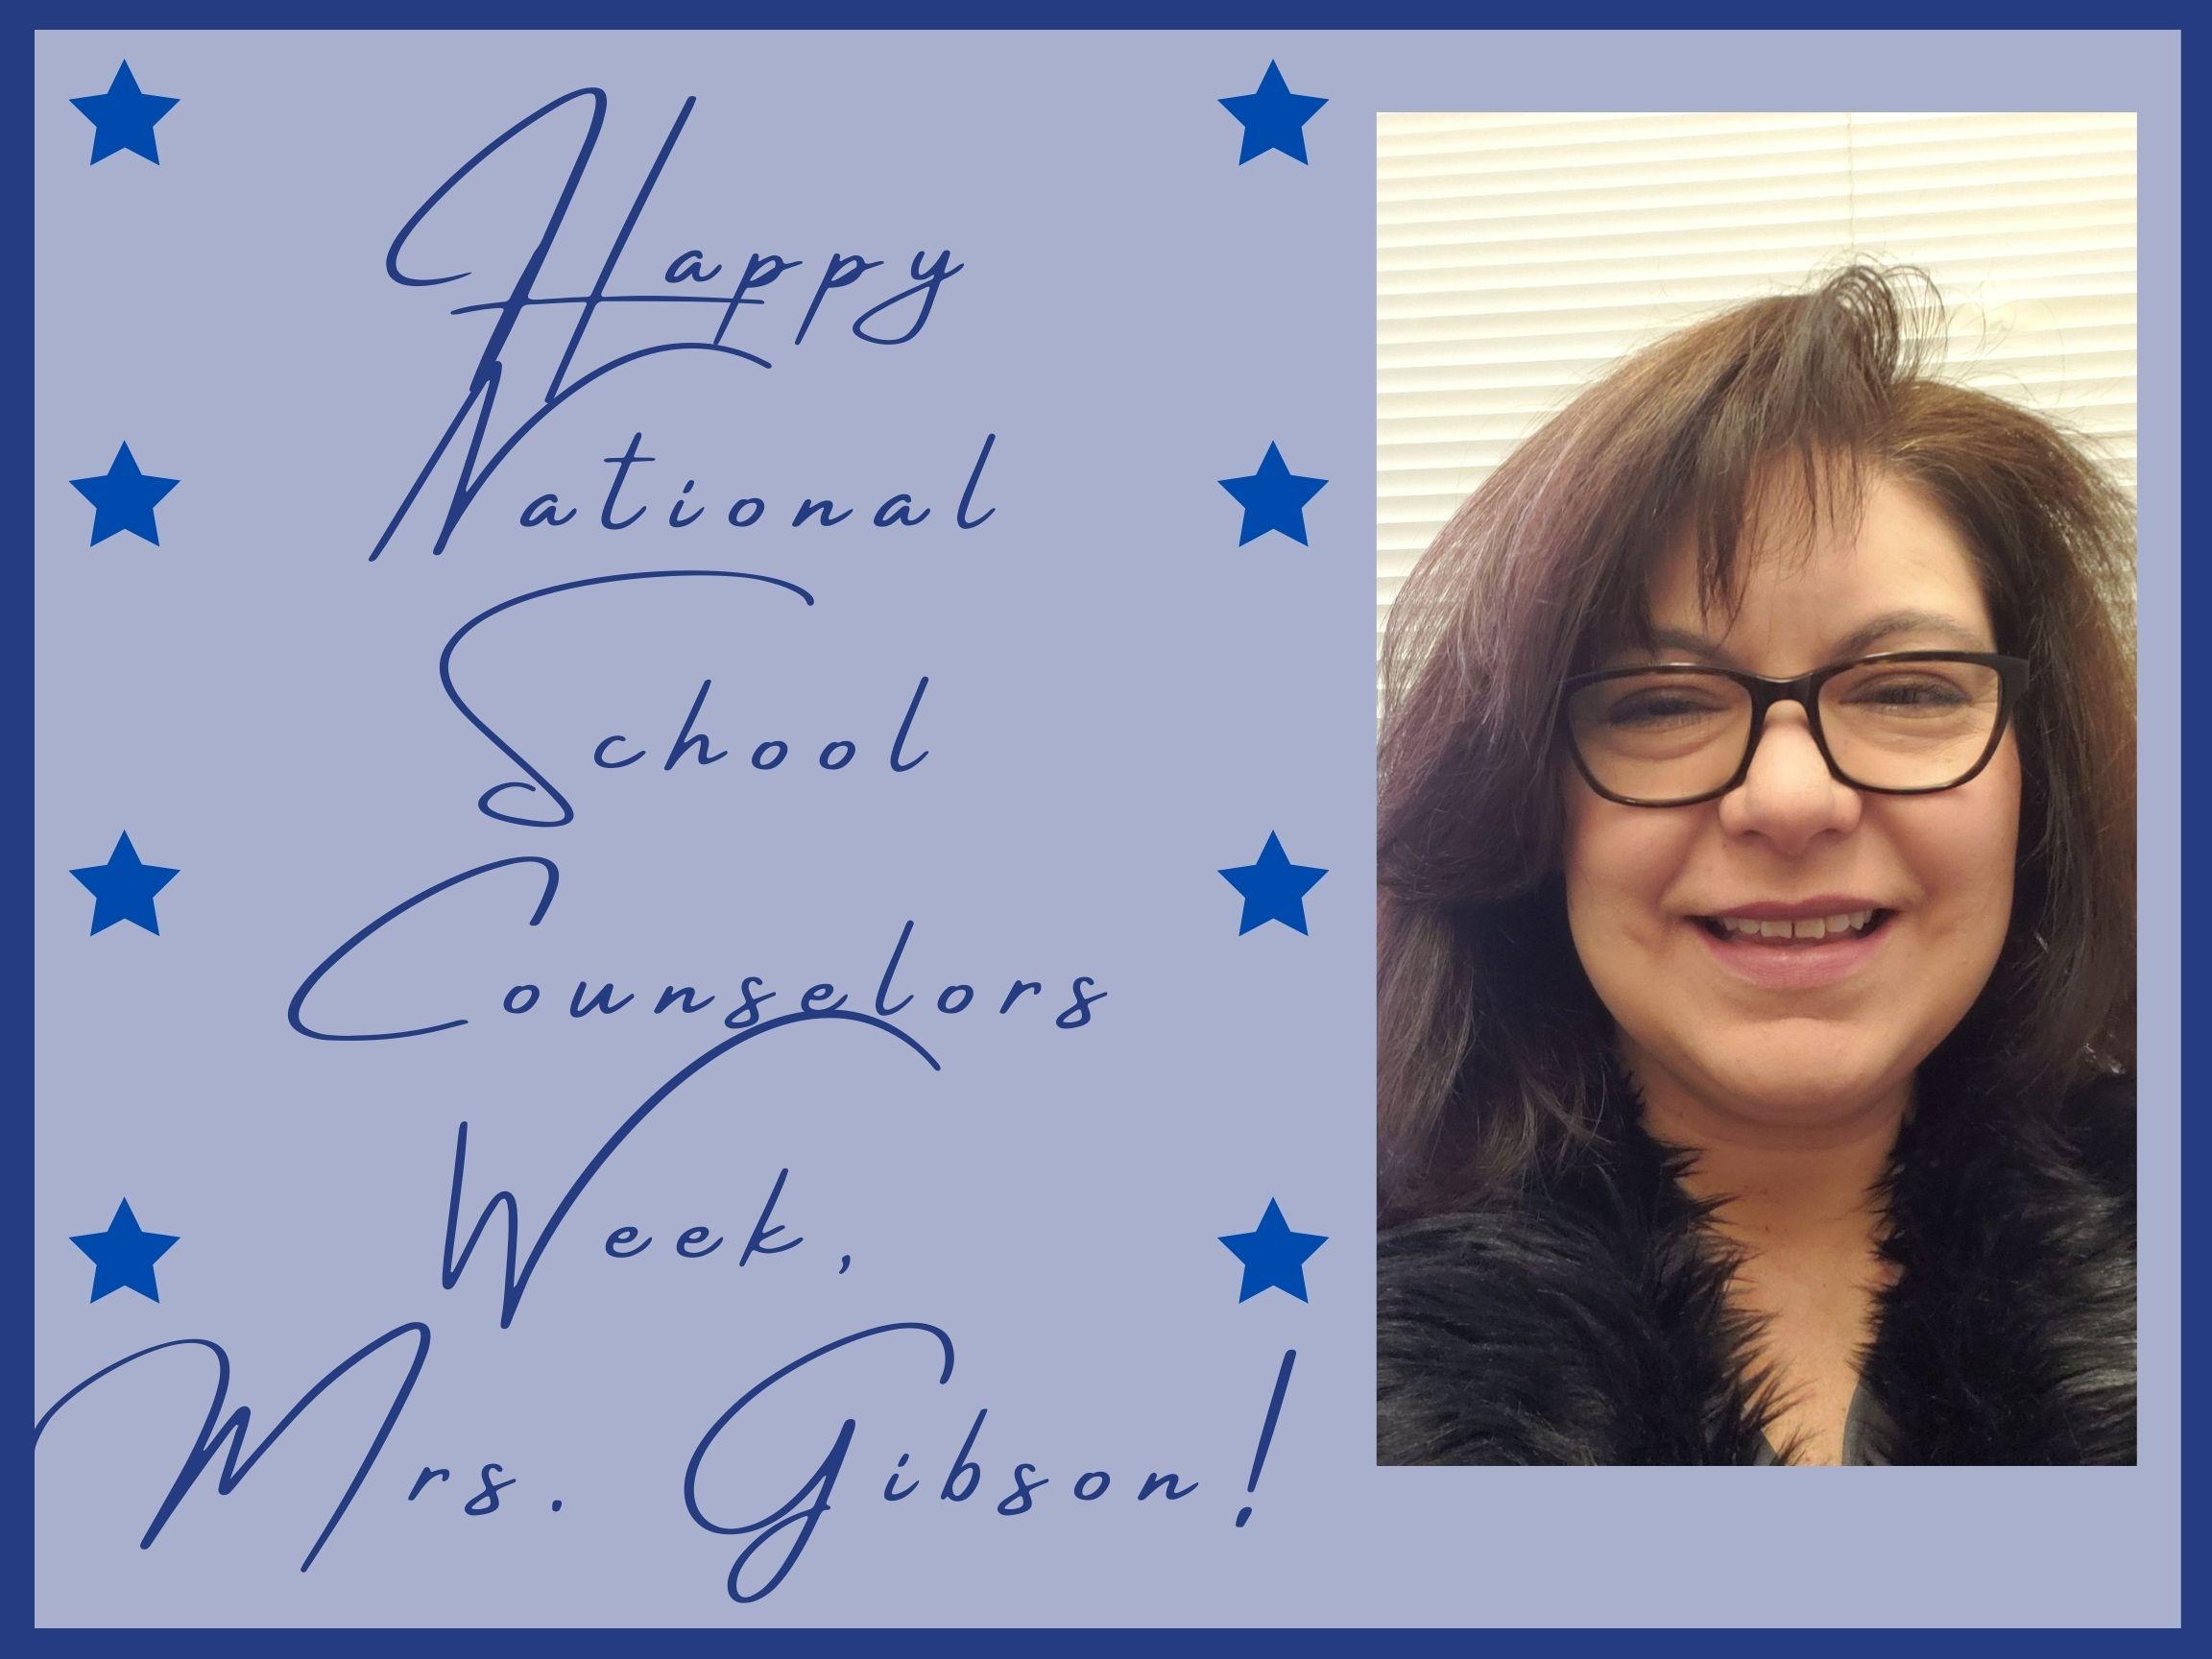 Happy National School Counselors Week